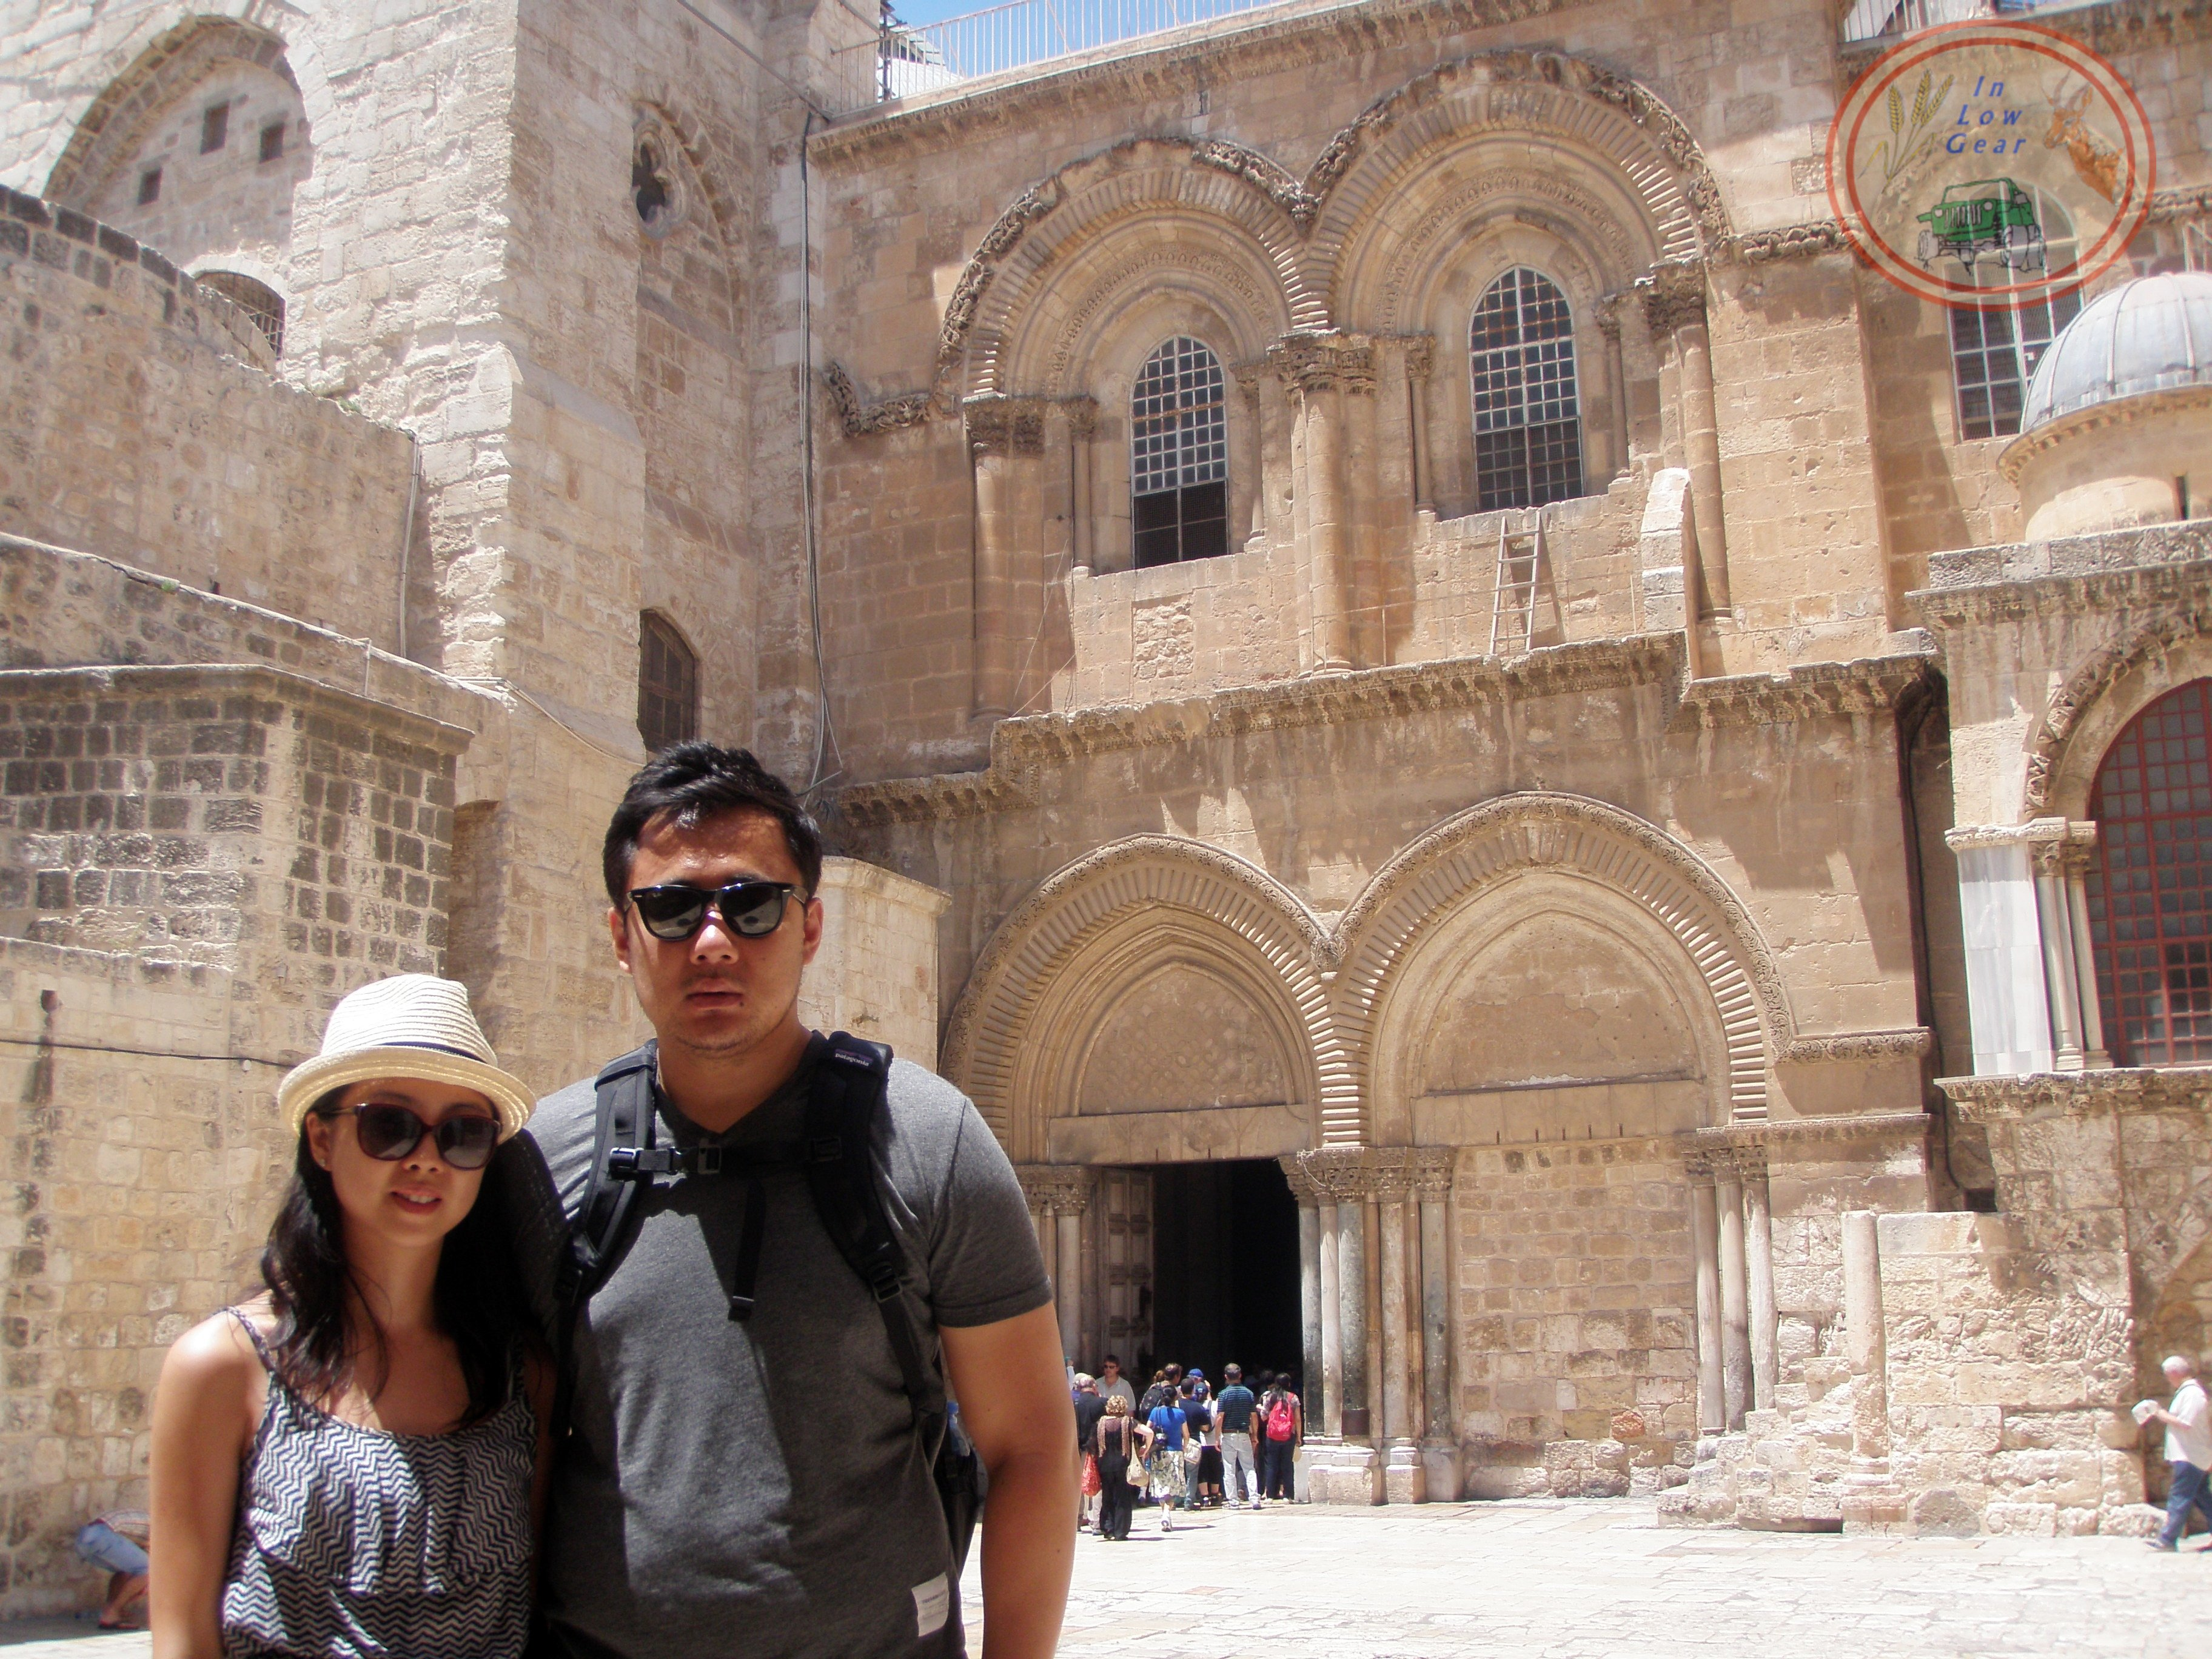 Jerusalem Church of Resurrection / Holy Sepulcher.